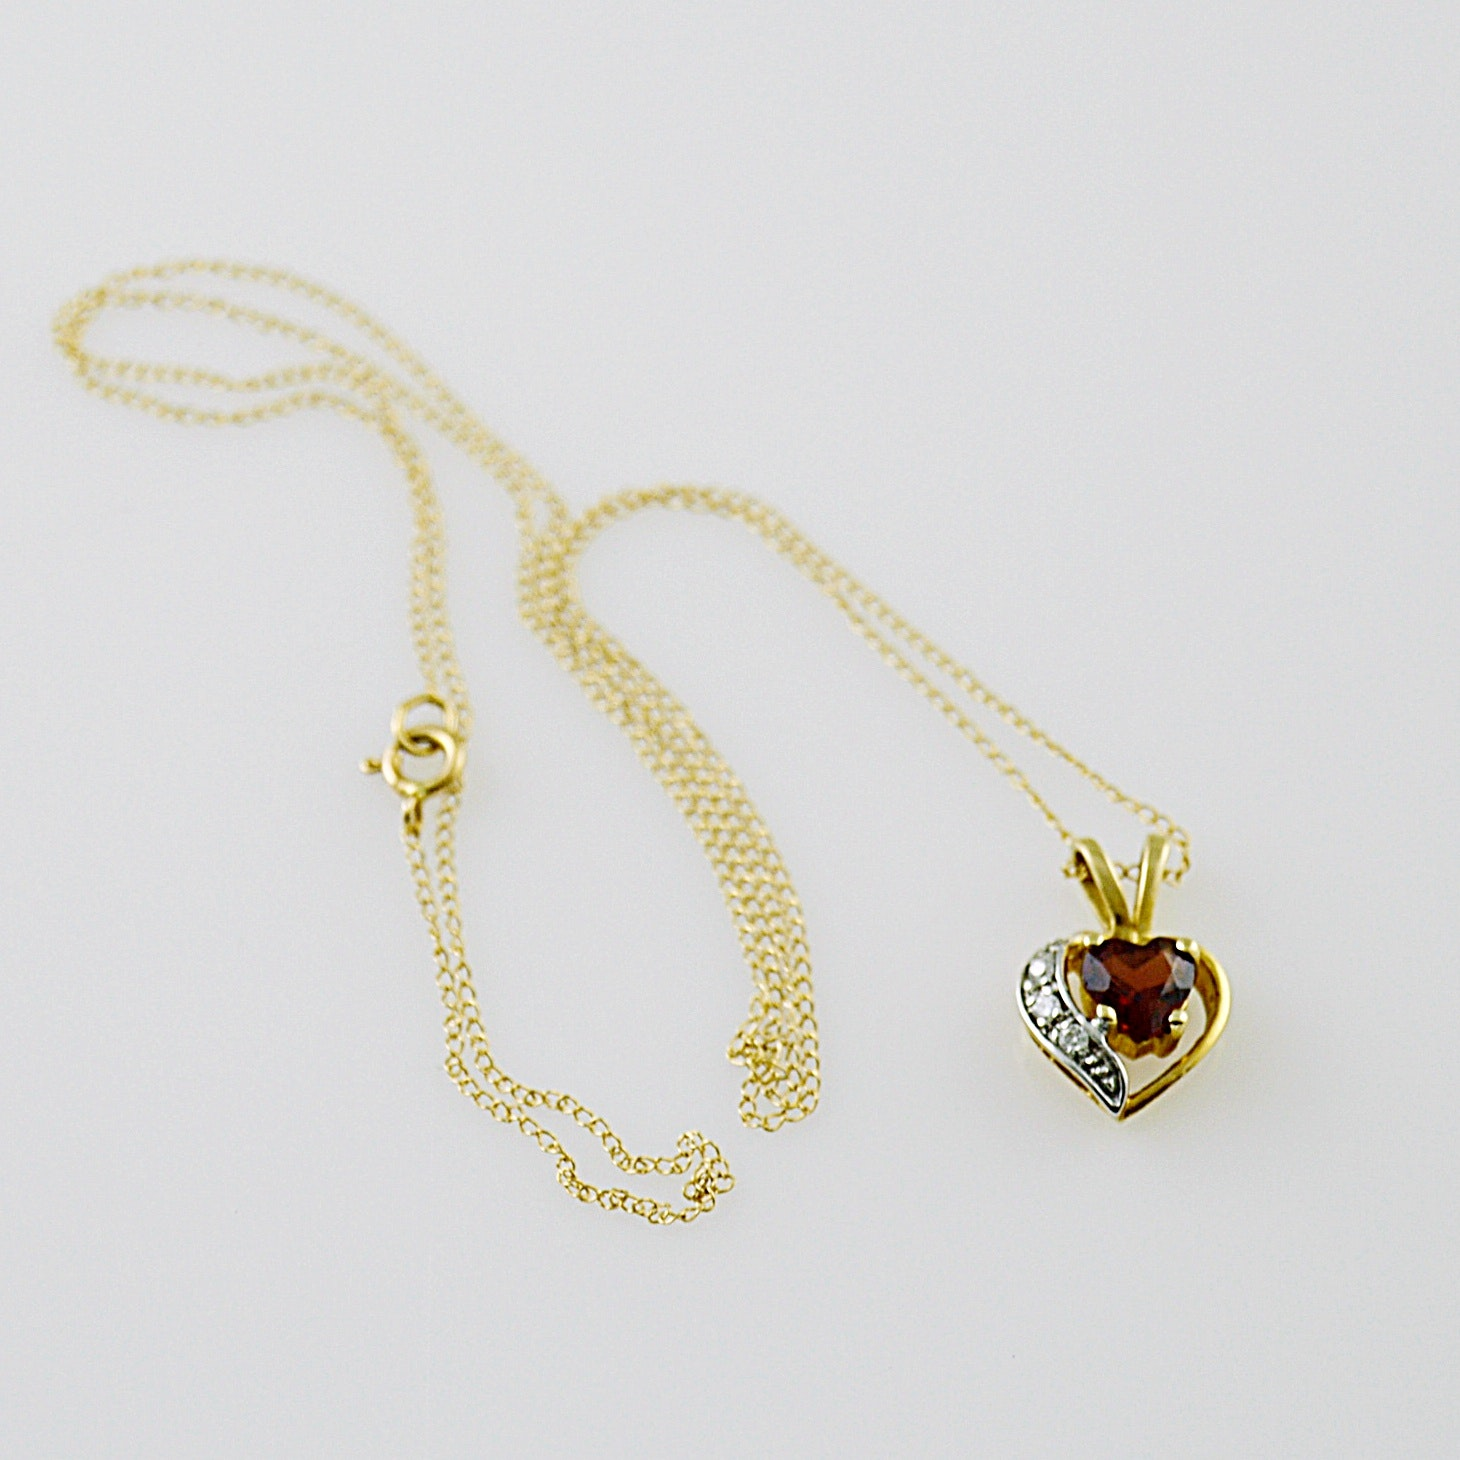 14K Gold, Diamond and Garnet Heart Pendant Necklace